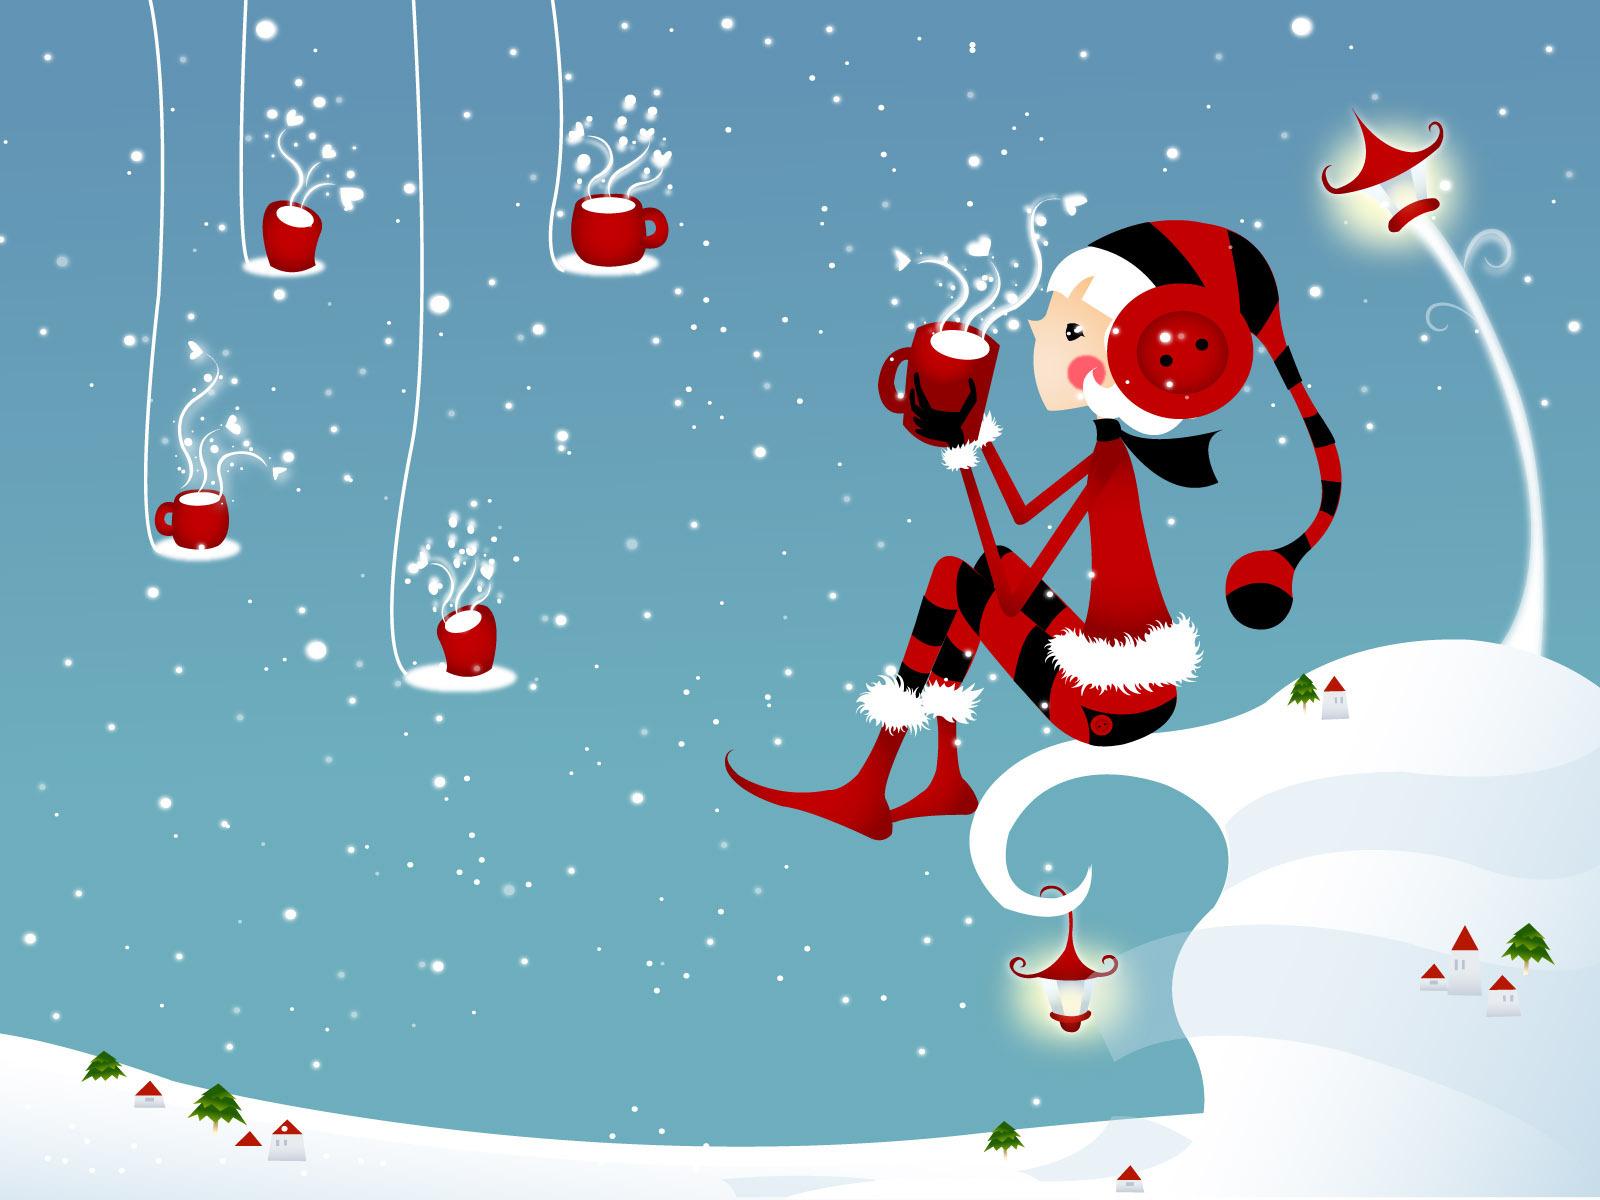 Christmas wallpaper   Christmas Wallpaper 9330975 1600x1200